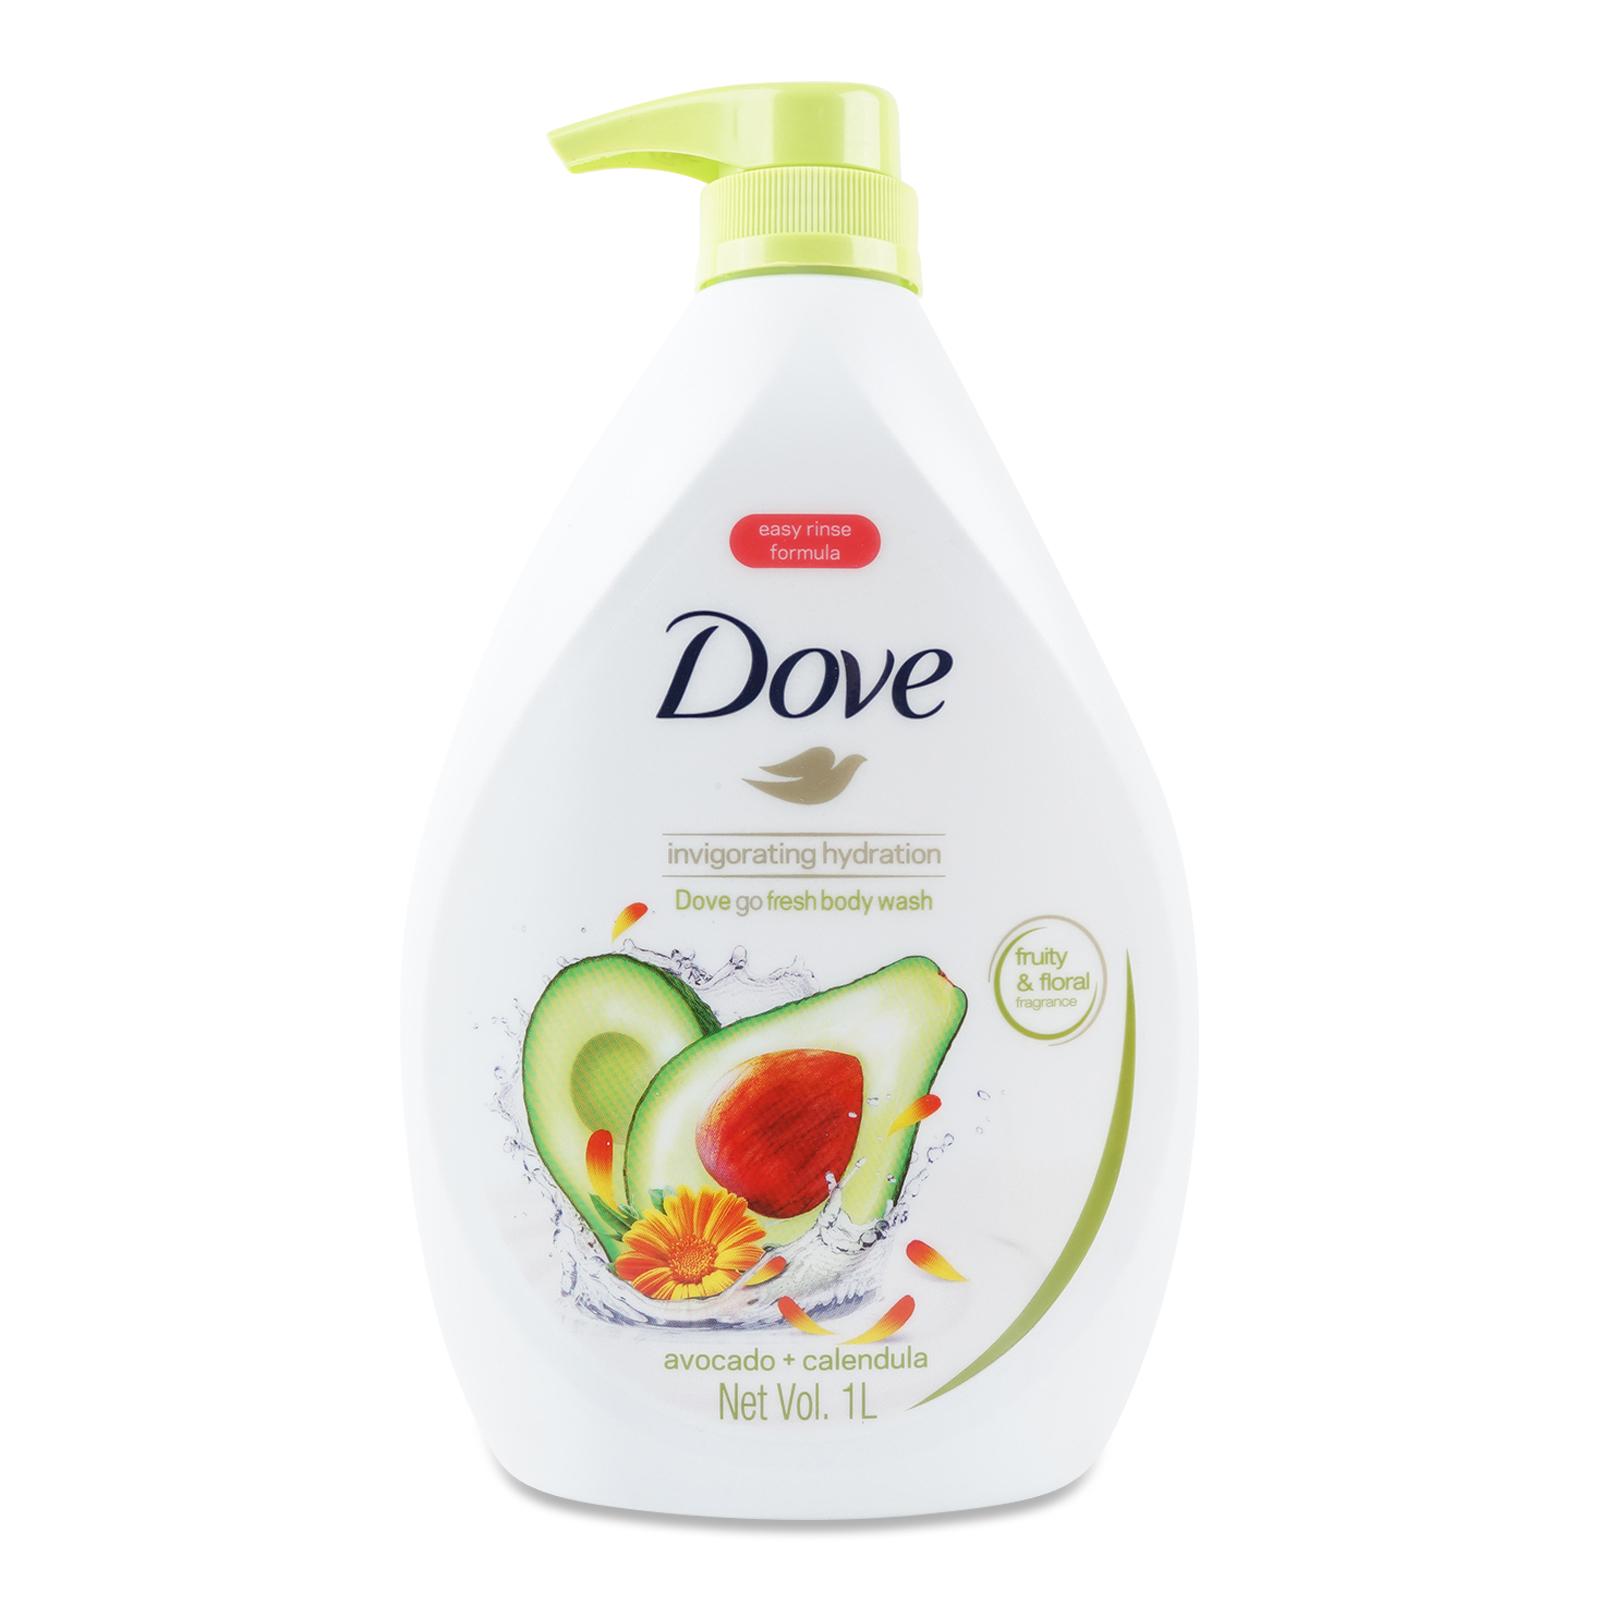 Avocado + Calendula Body Wash